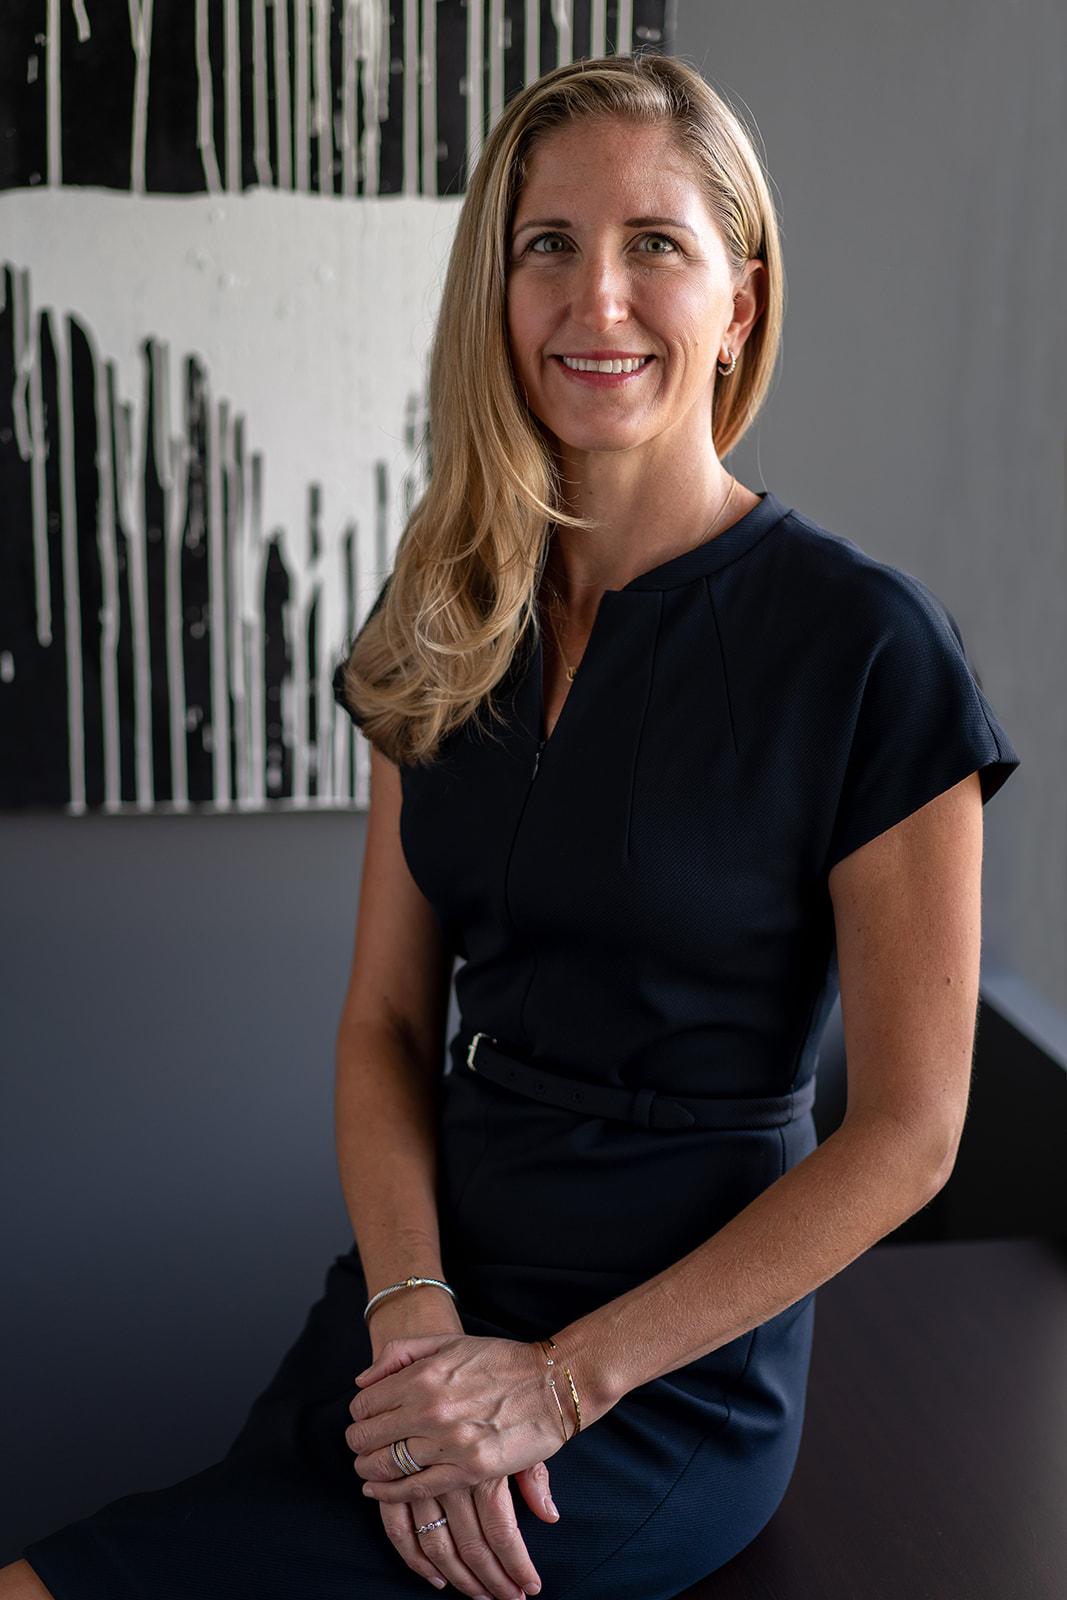 Kristin Demeritt